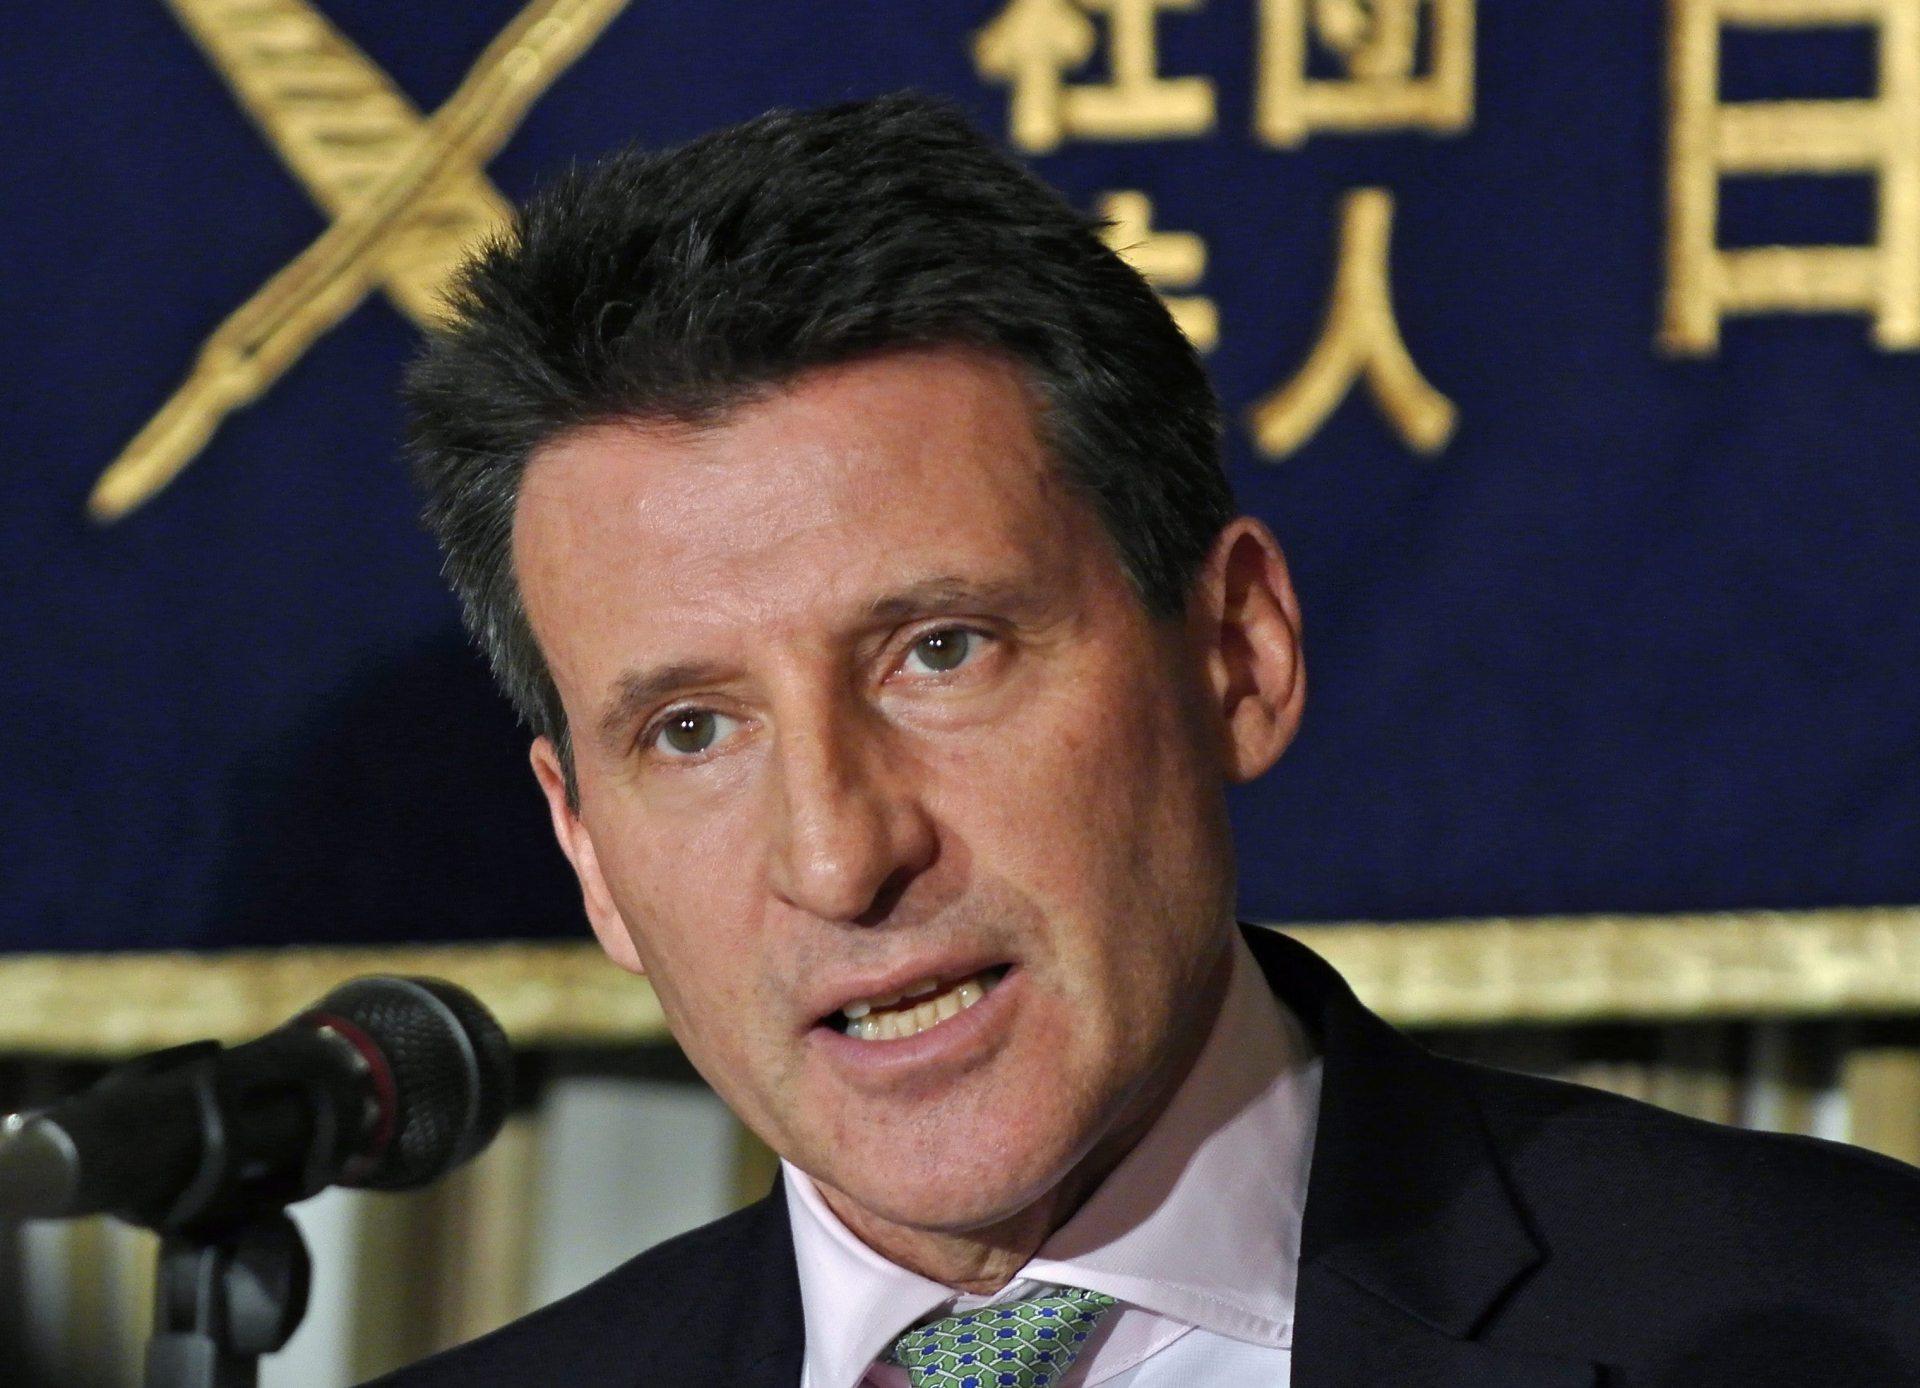 Sebastian Coe novi predsjednik IAAF-a